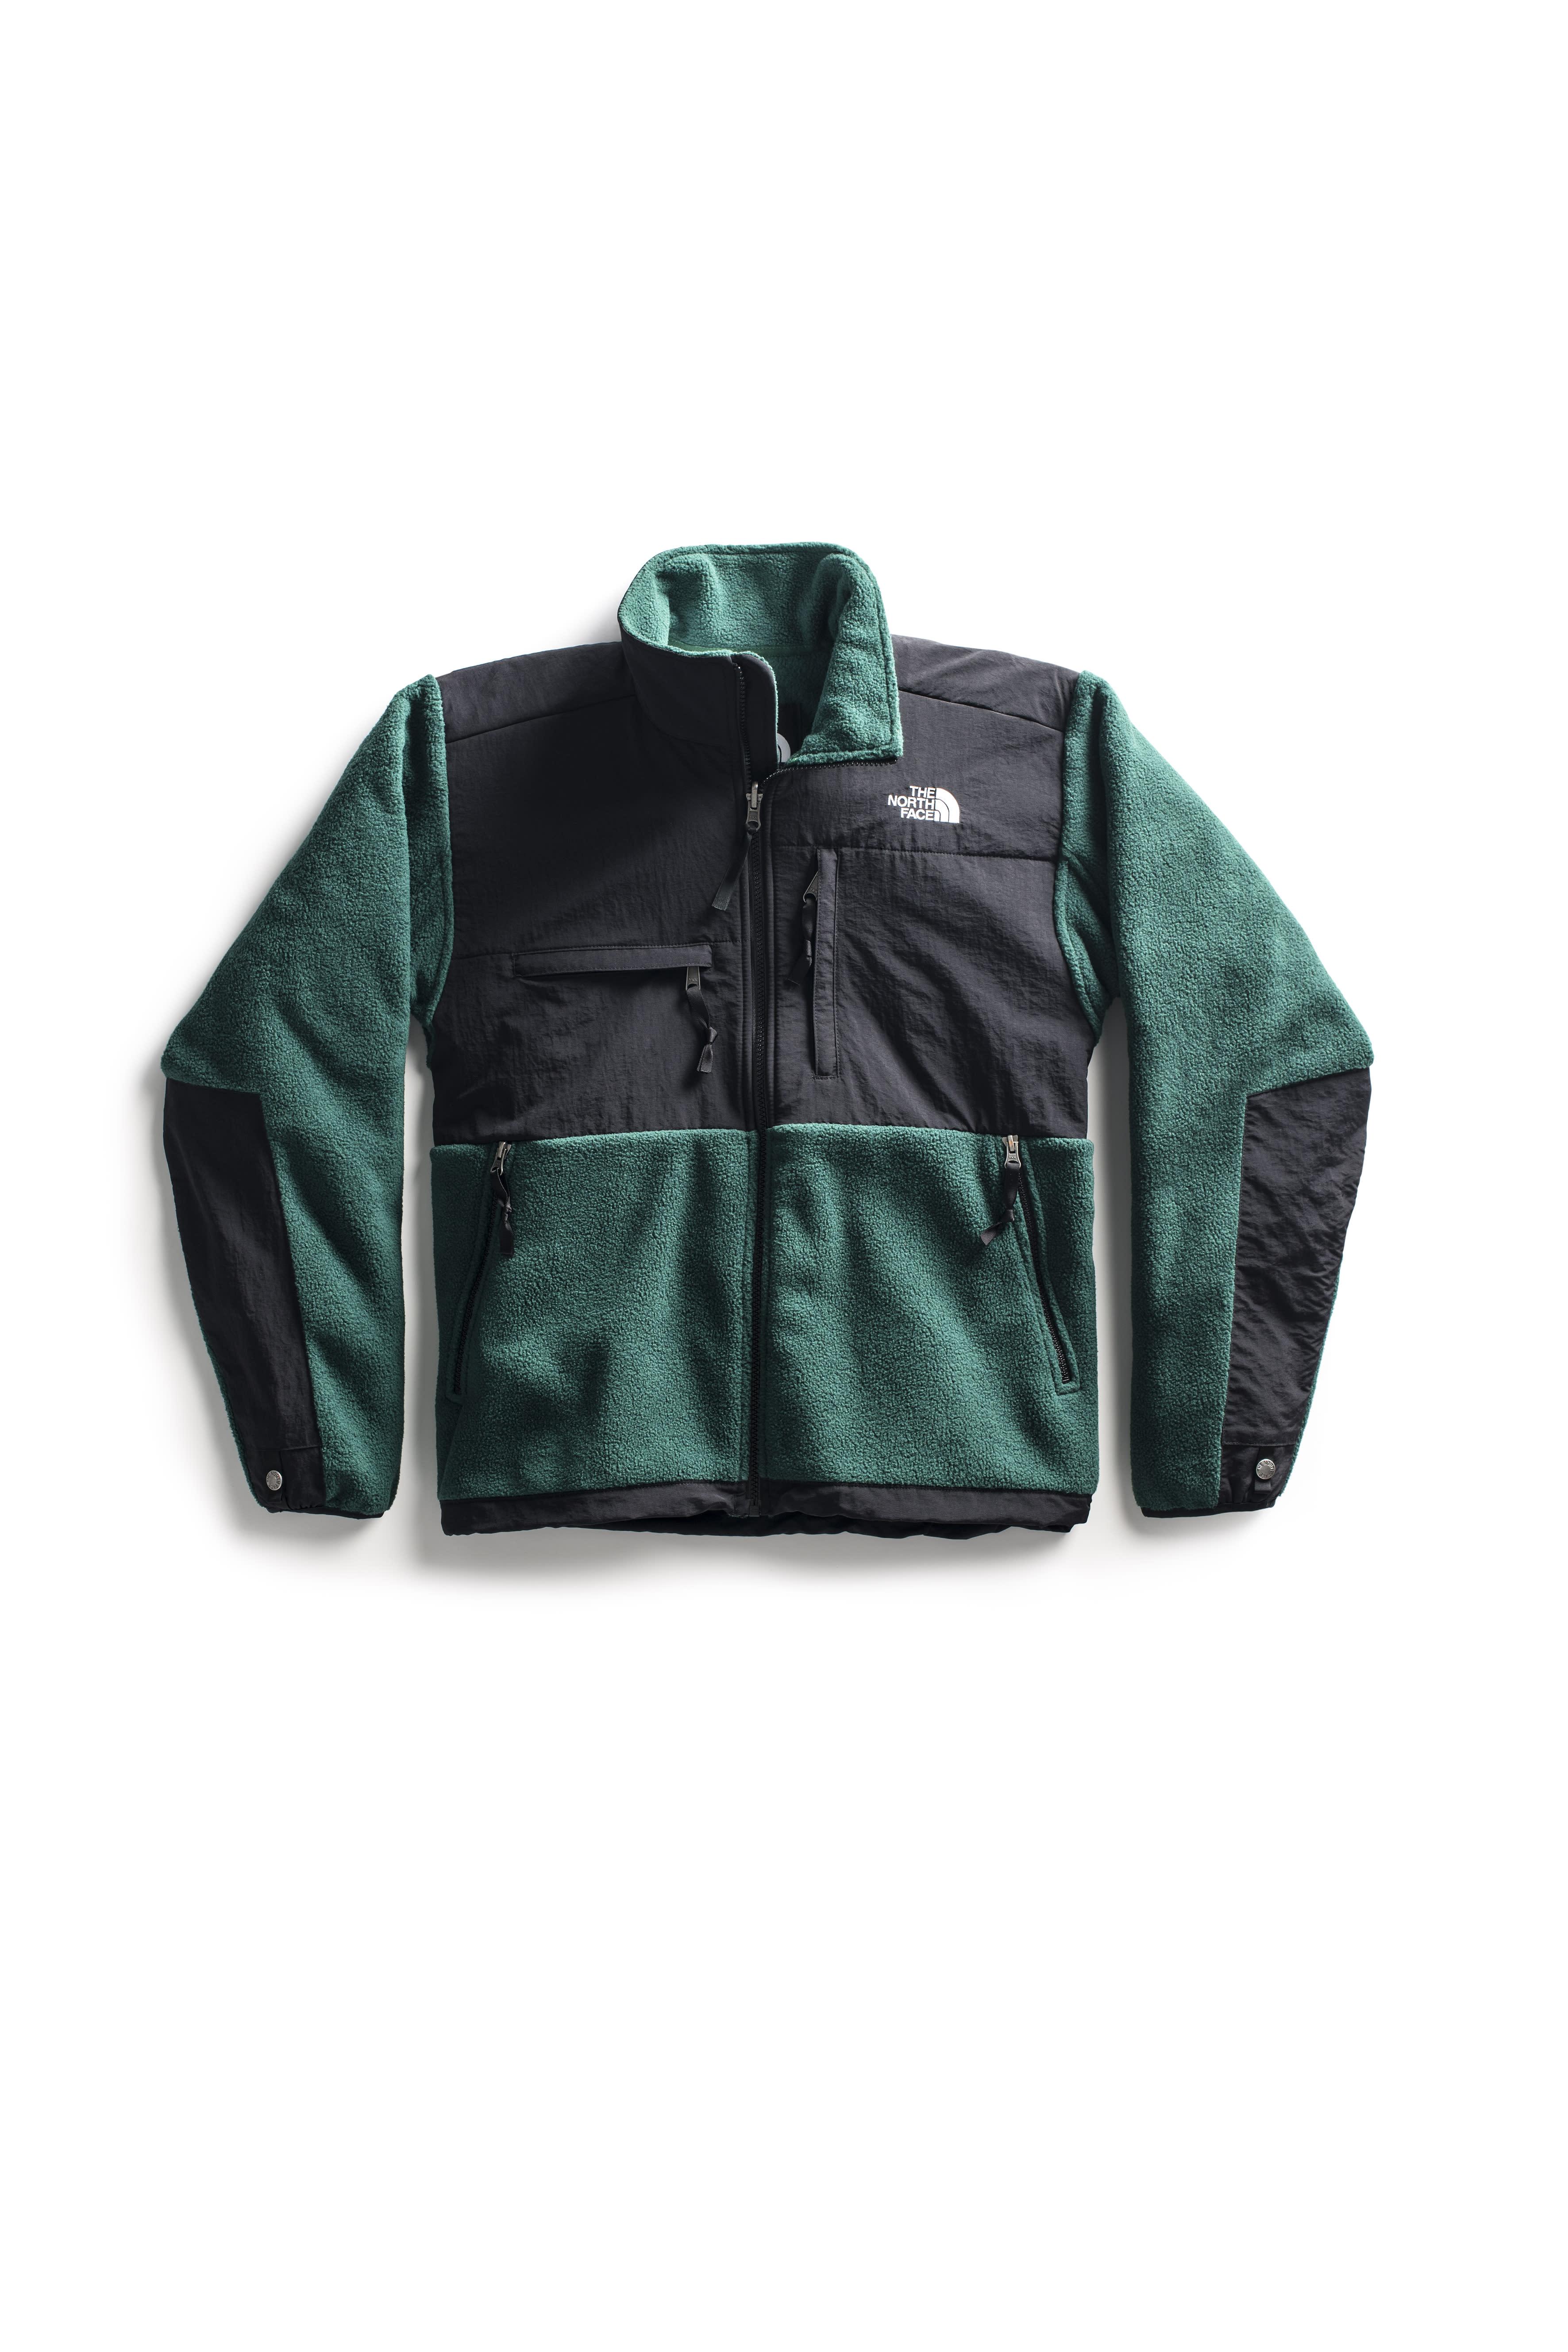 tnf-denali-green